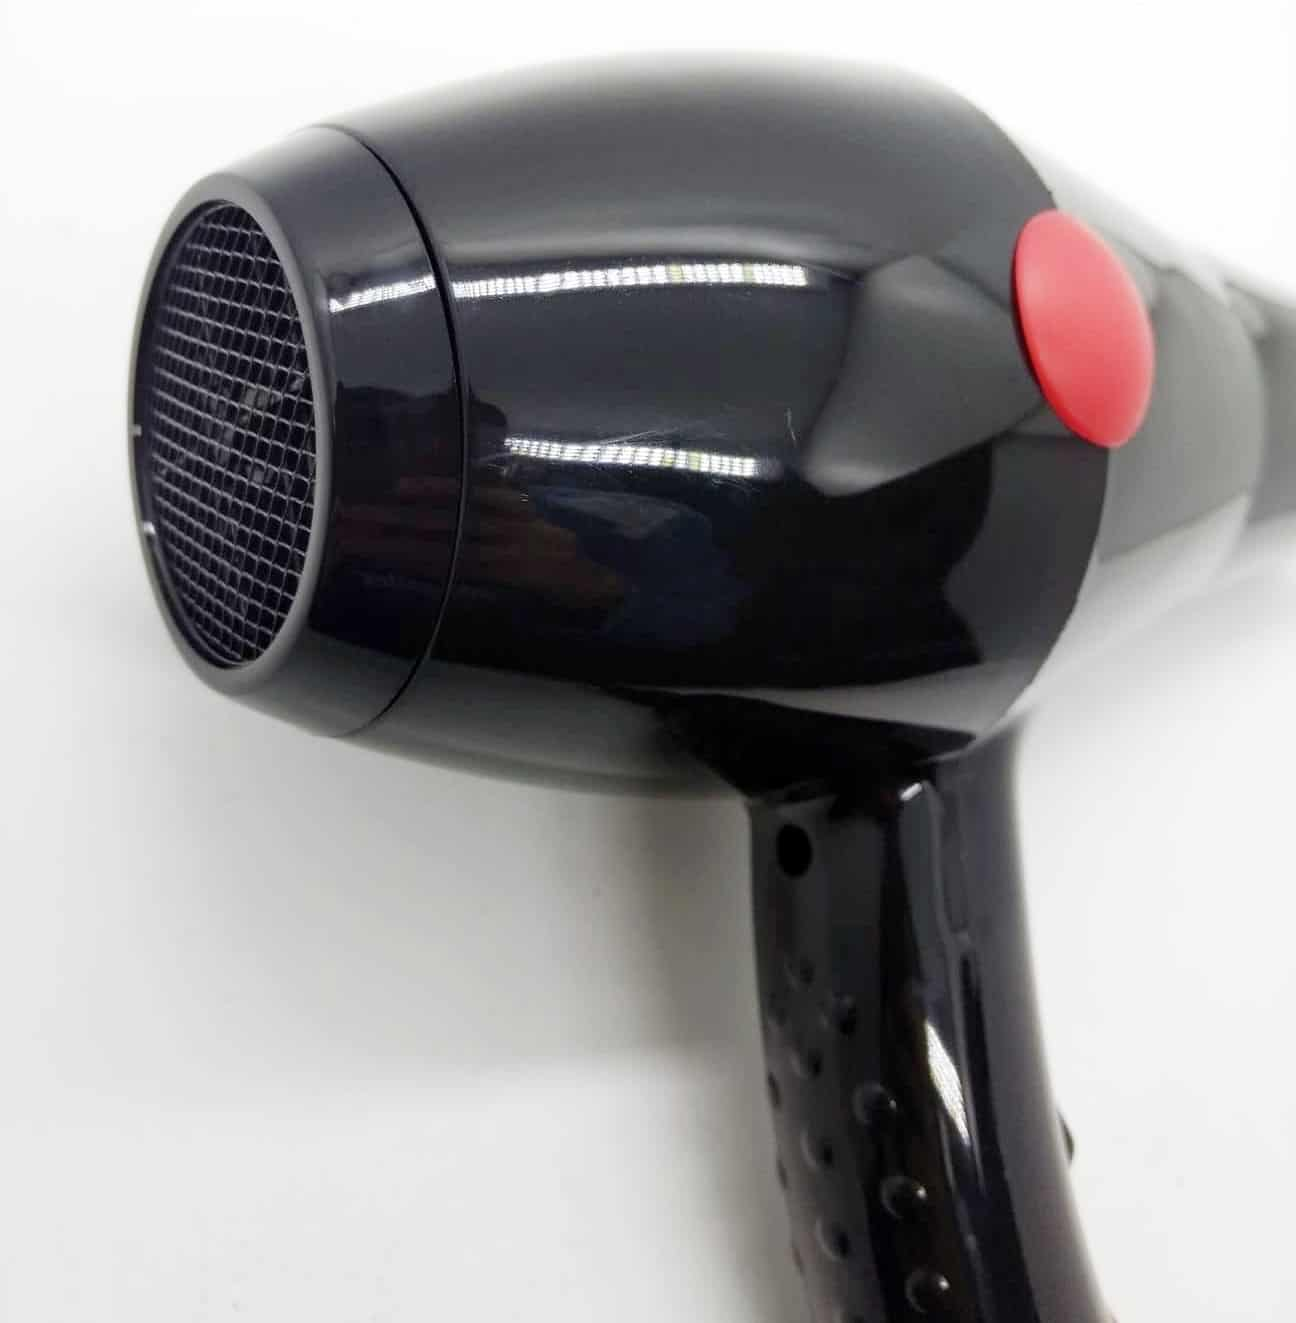 Secador Profissional 3900 - Sonar